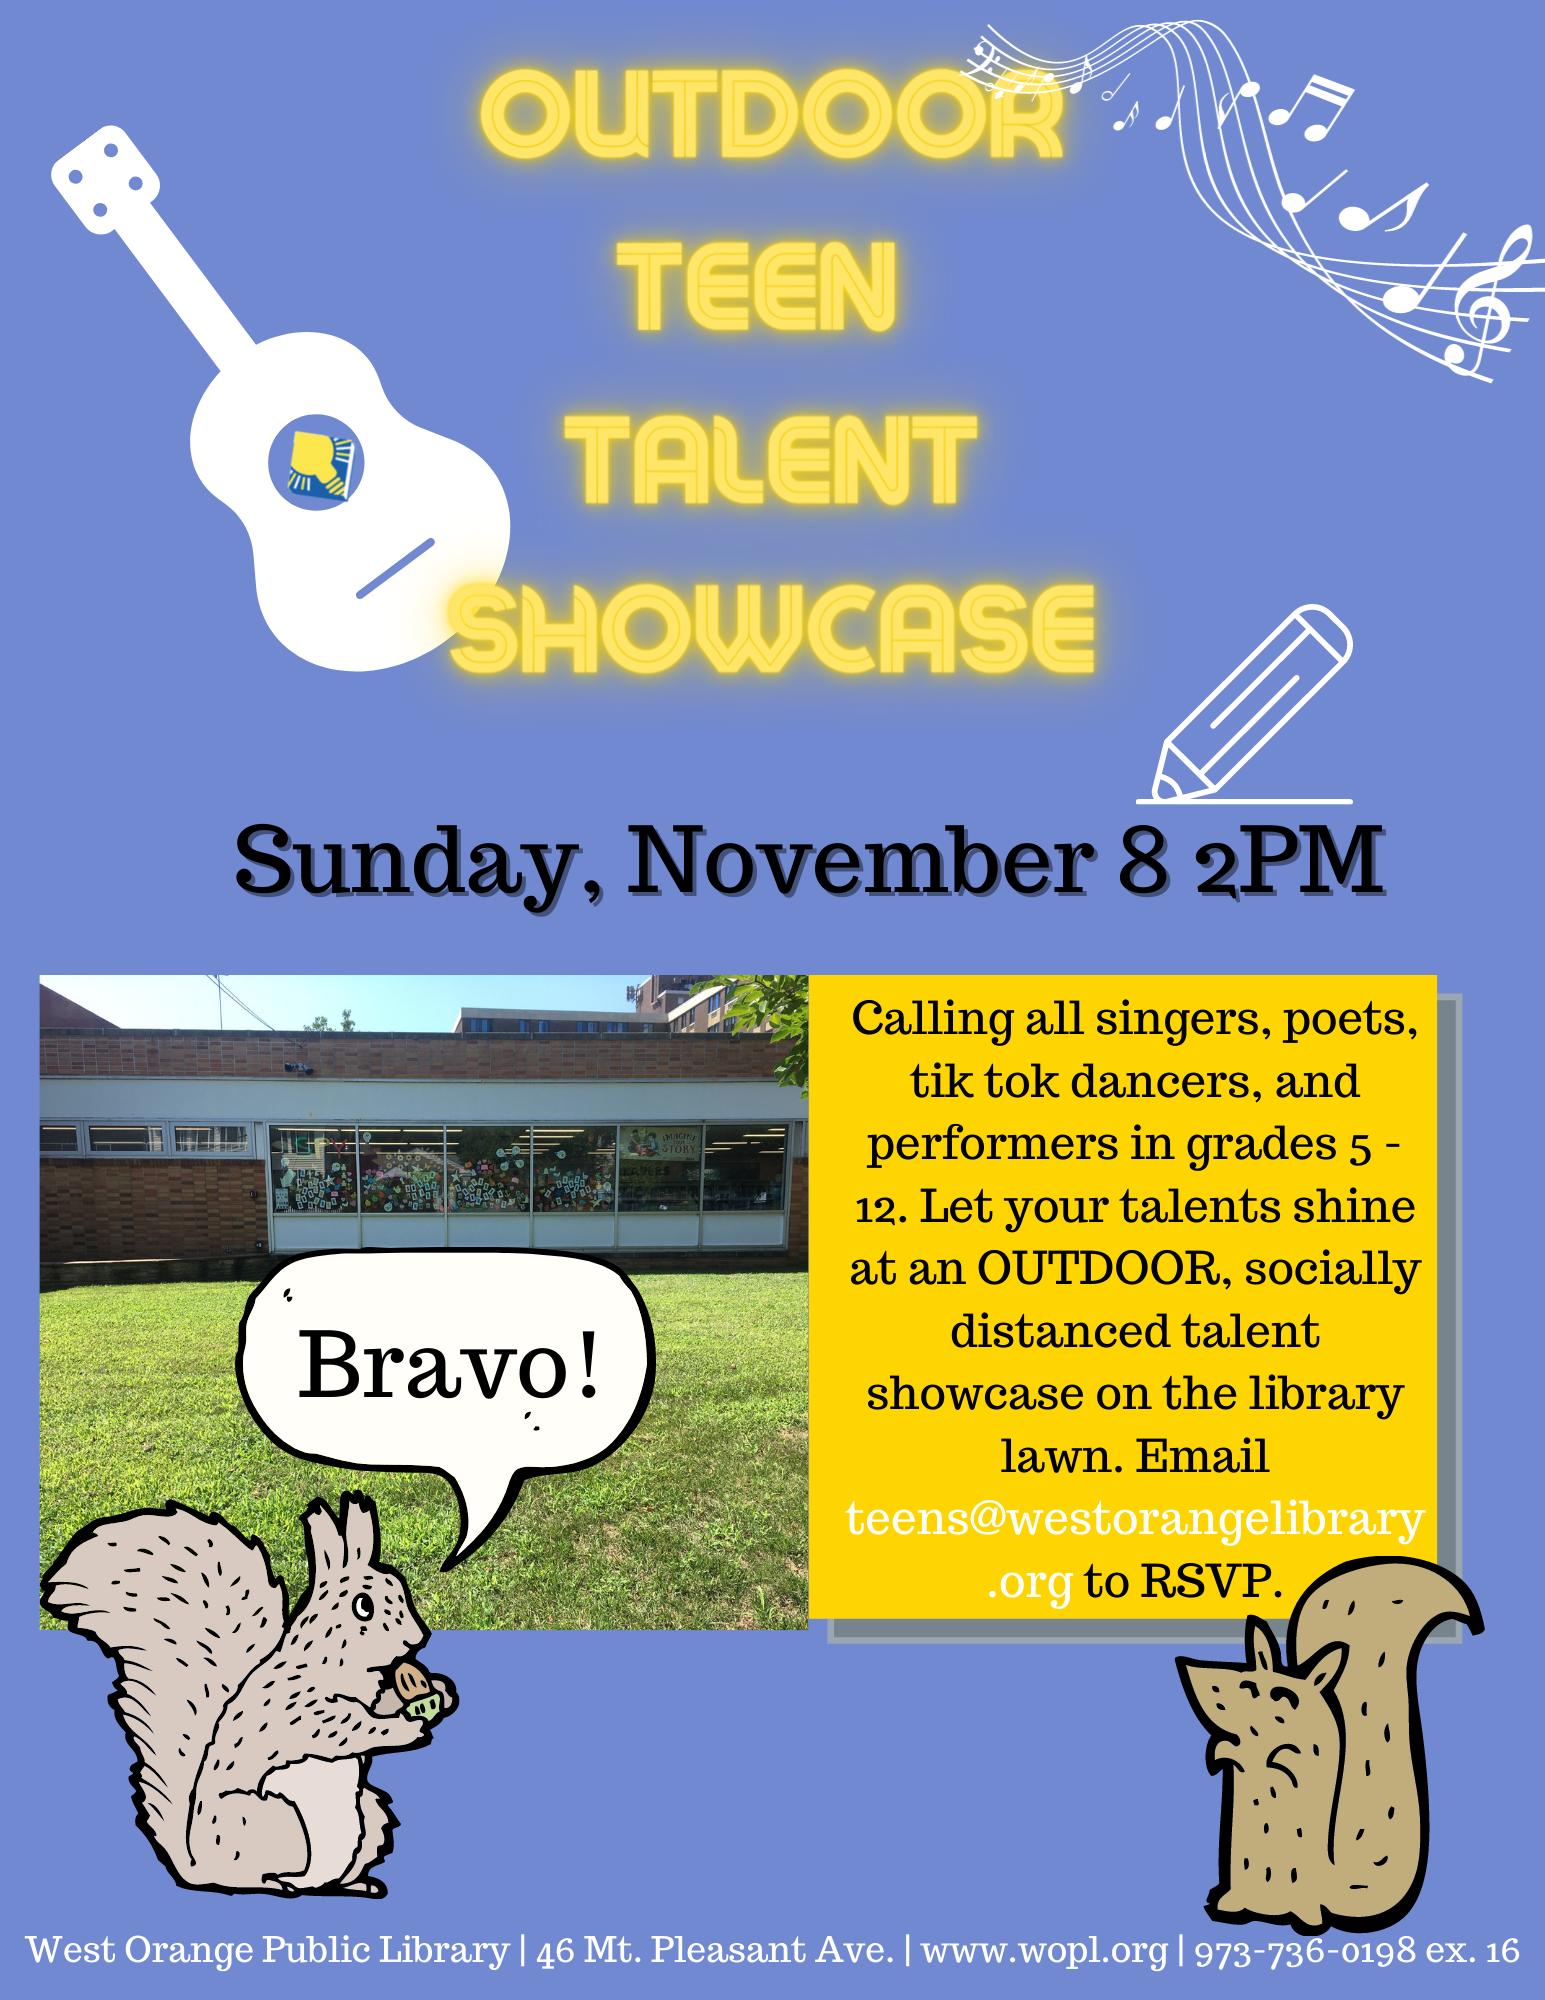 Outdoor Teen Talent Showcase